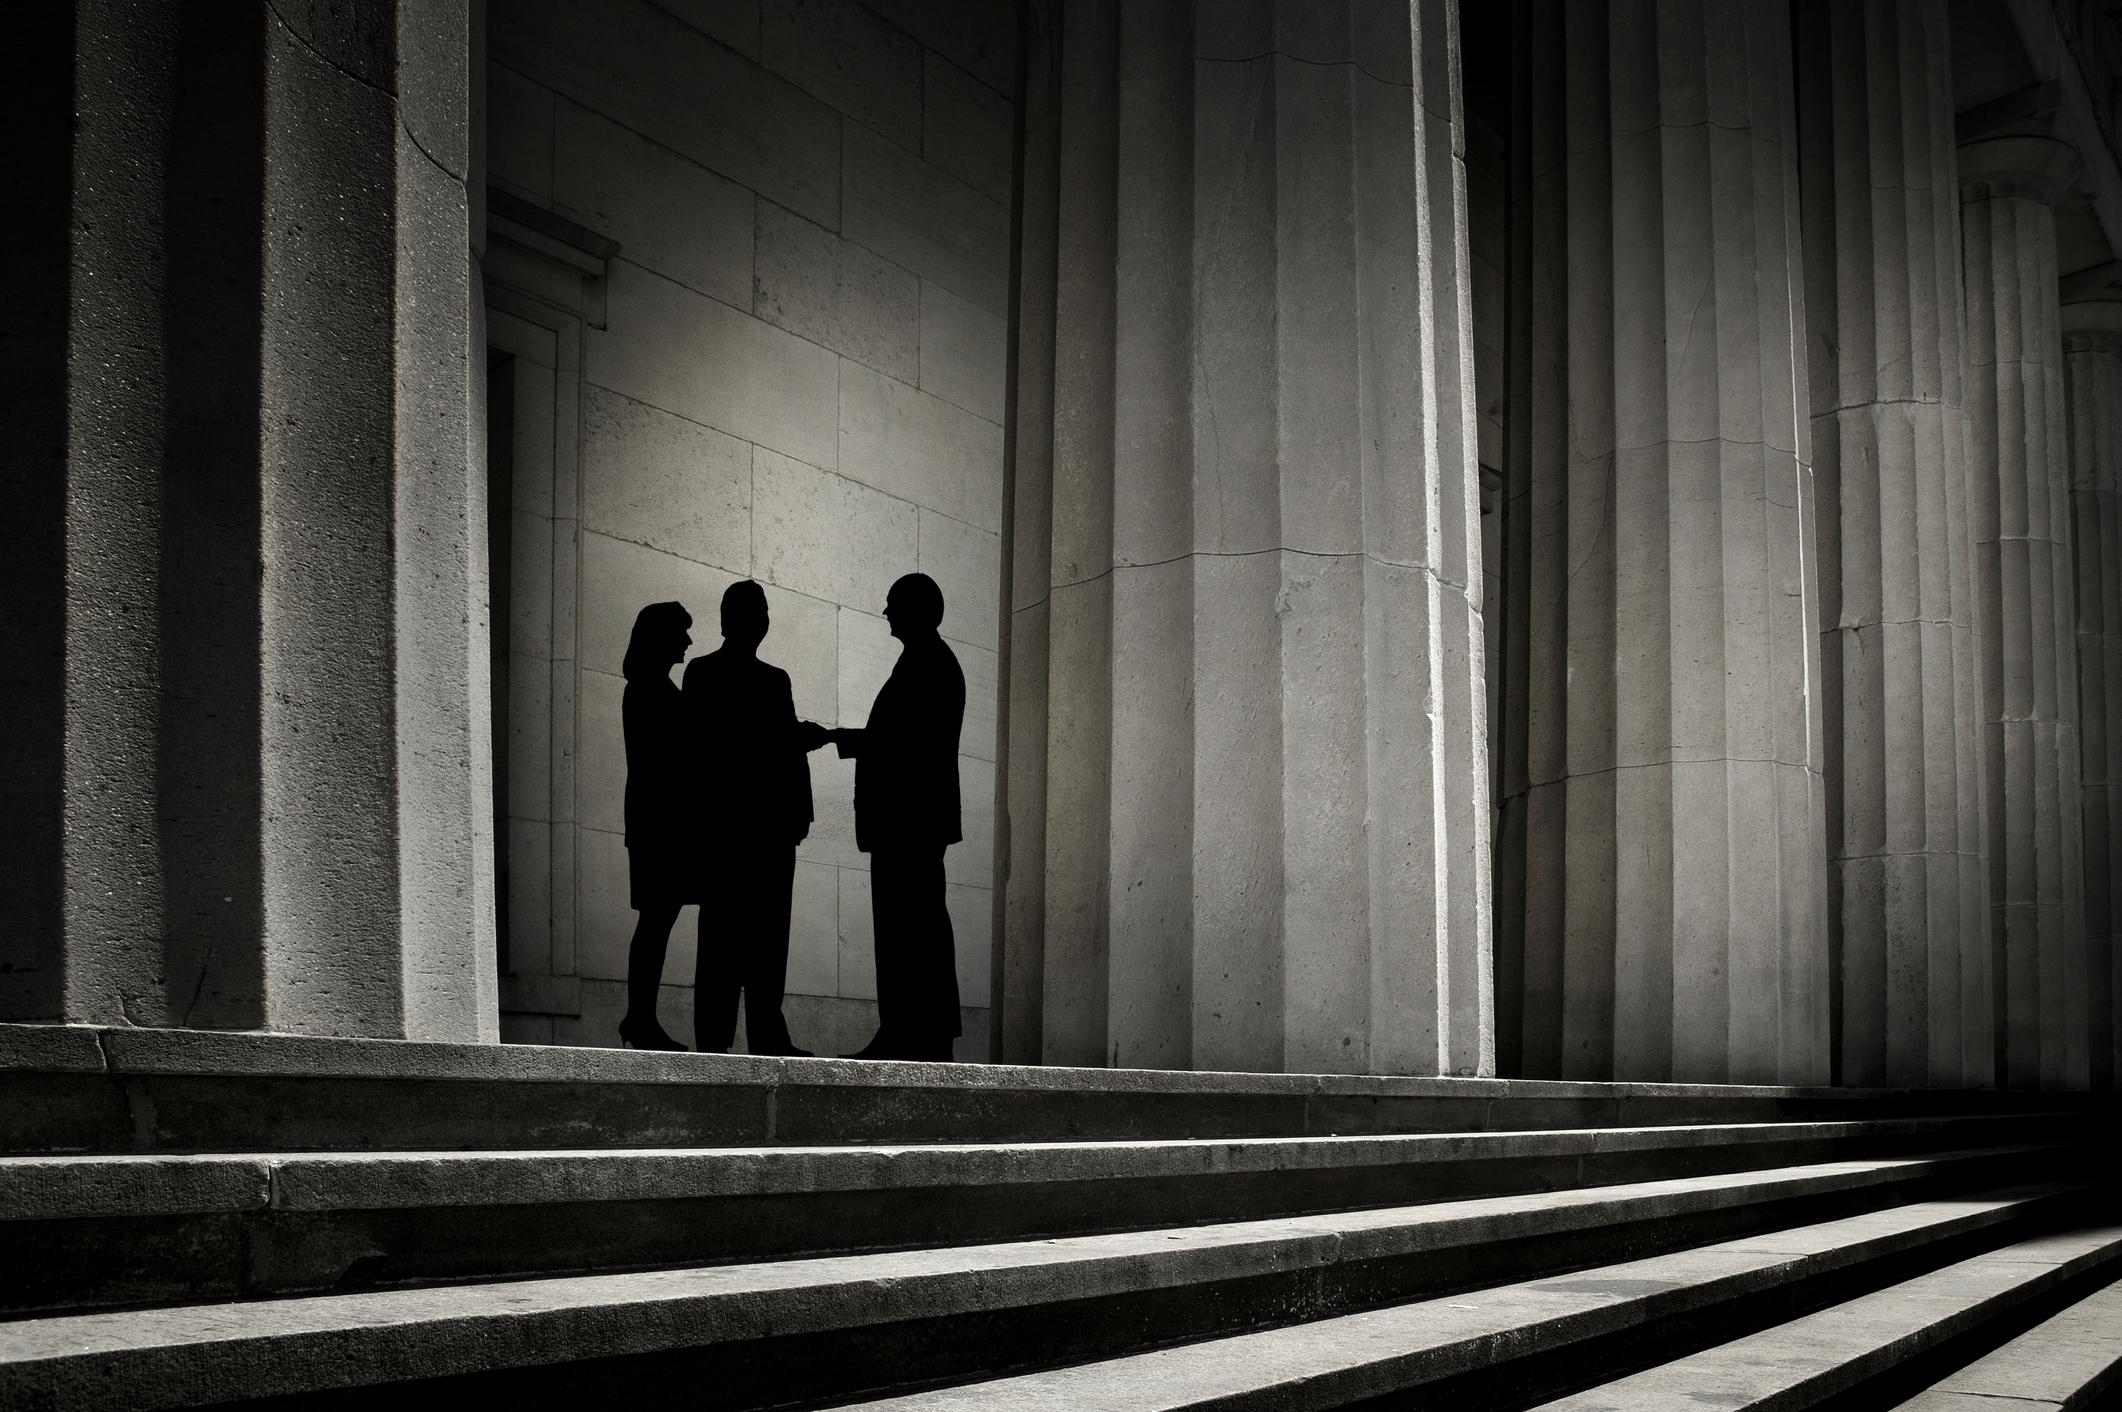 Lawmakers decide on billions in spending, shrouded in secrecy